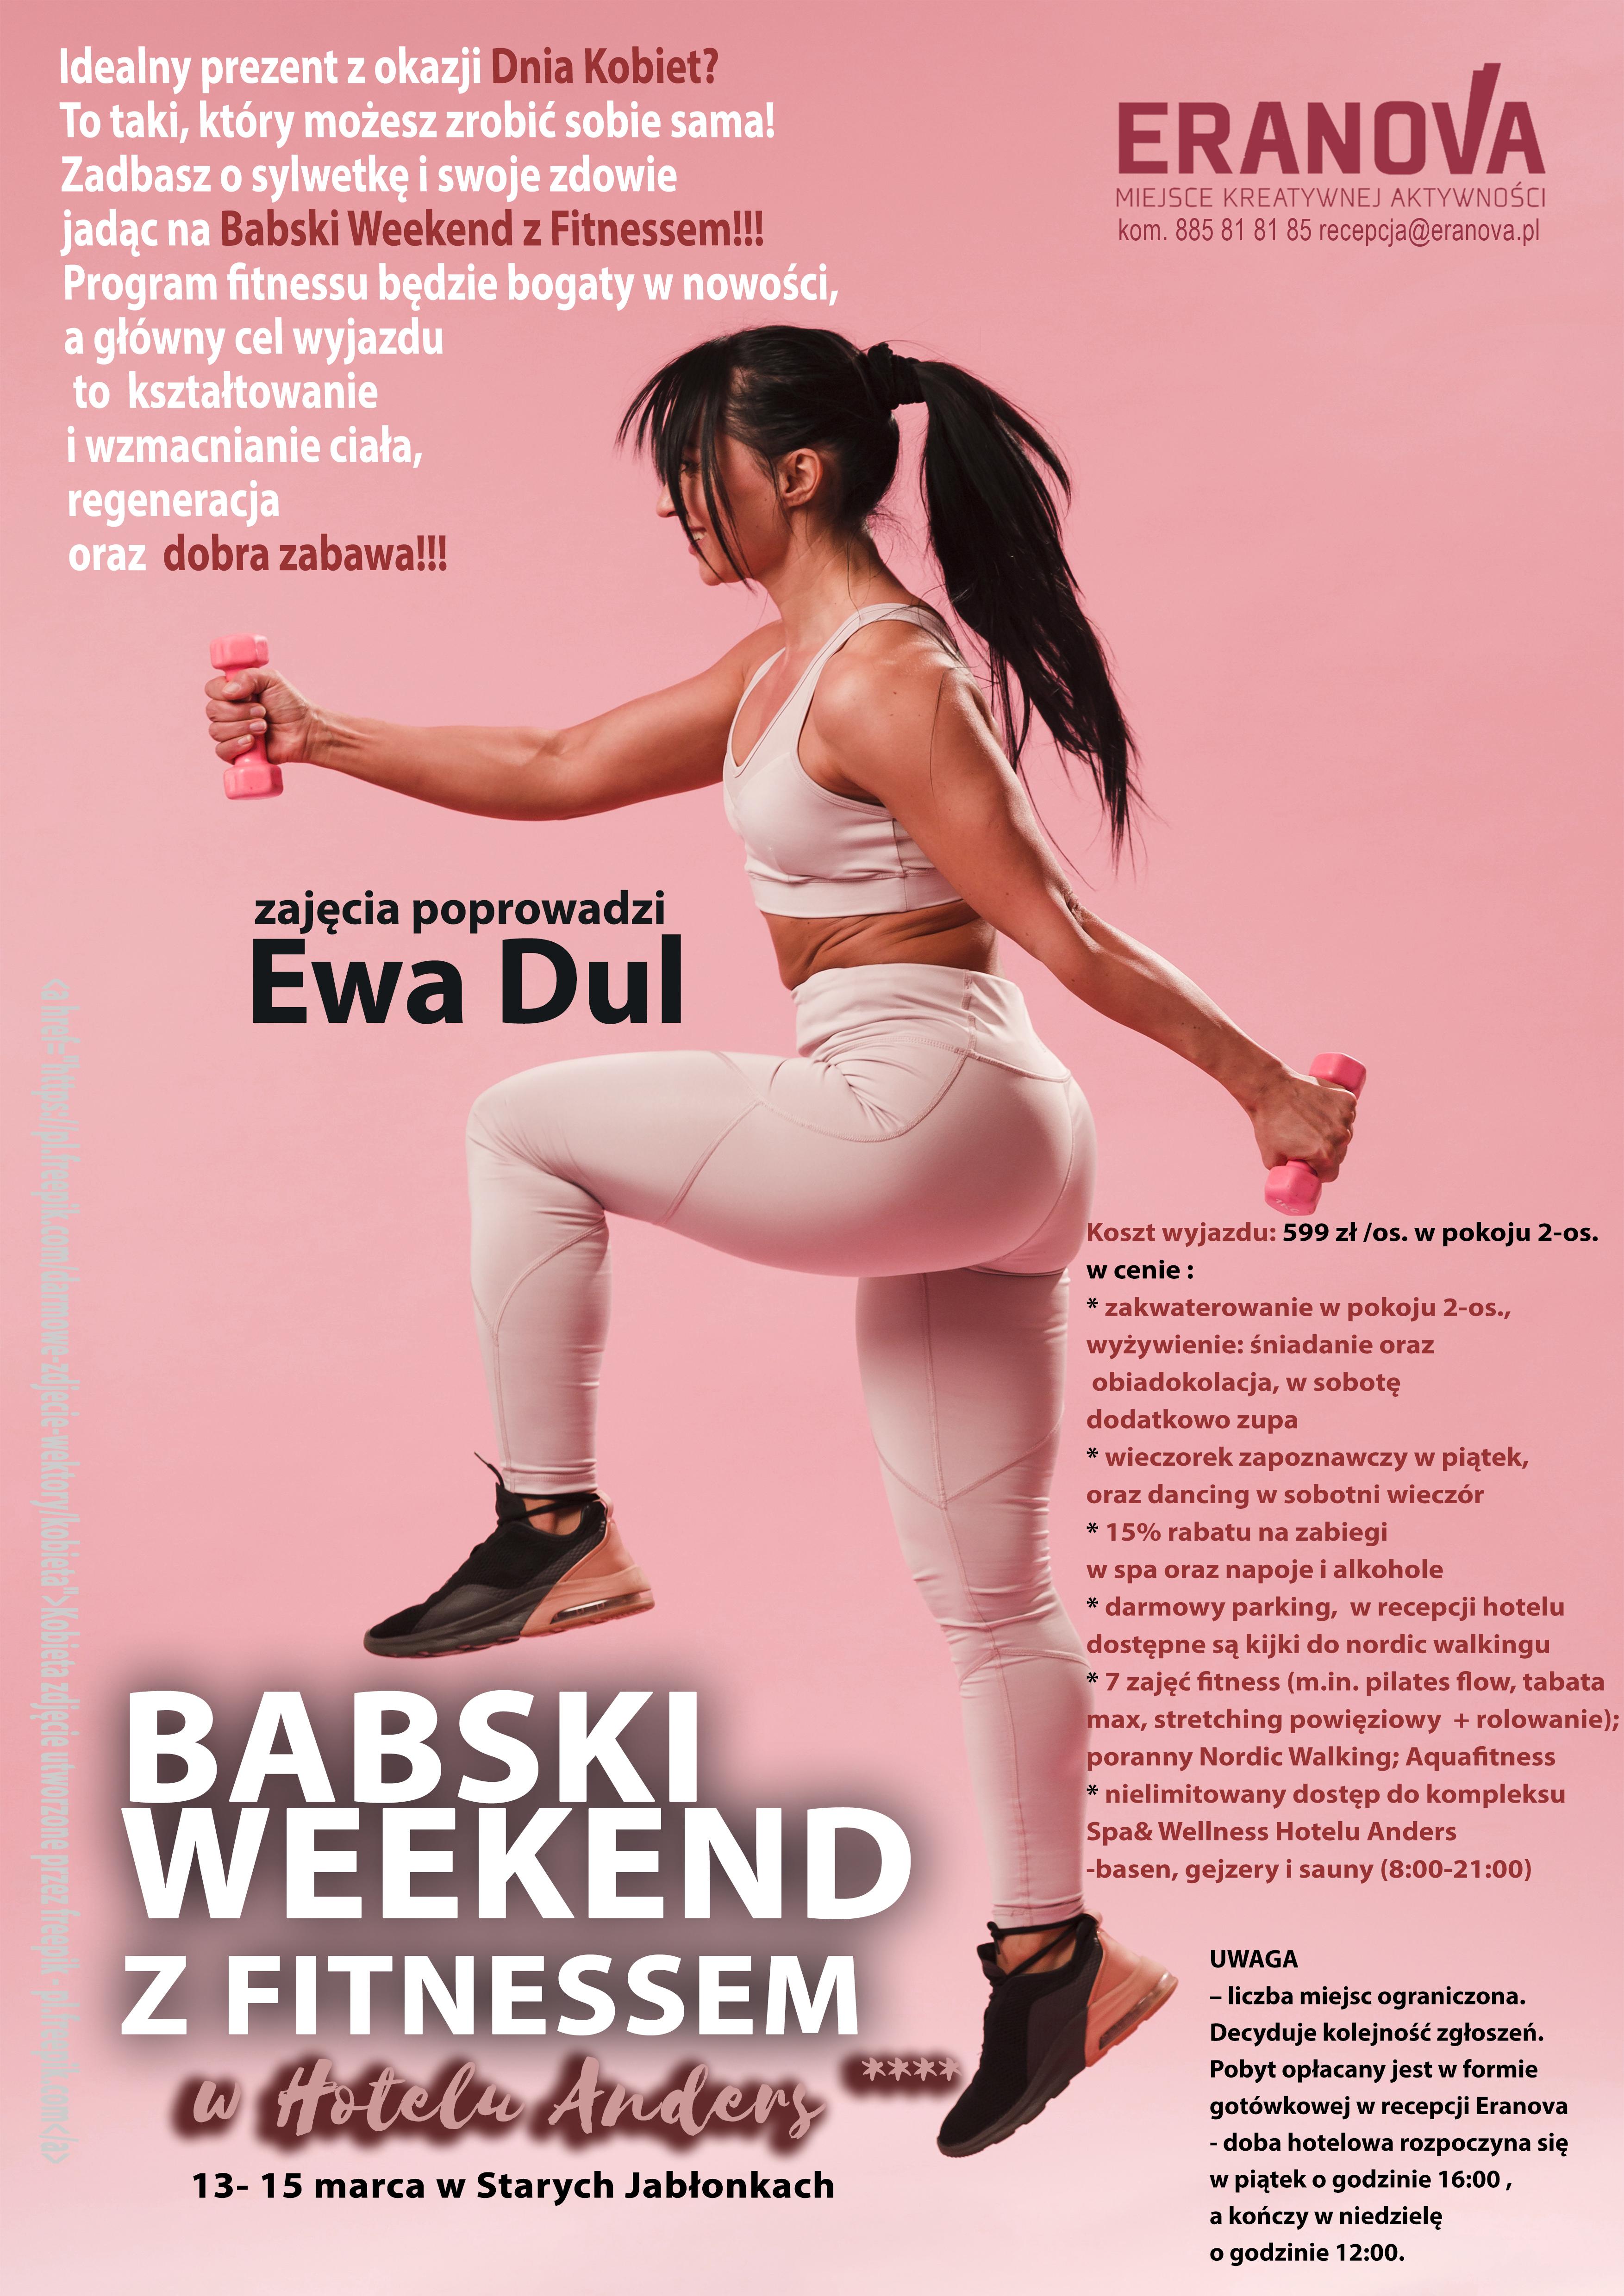 http://m.eranova.pl/2020/02/orig/weekend-z-fitnessem-w-ha-3234.jpg